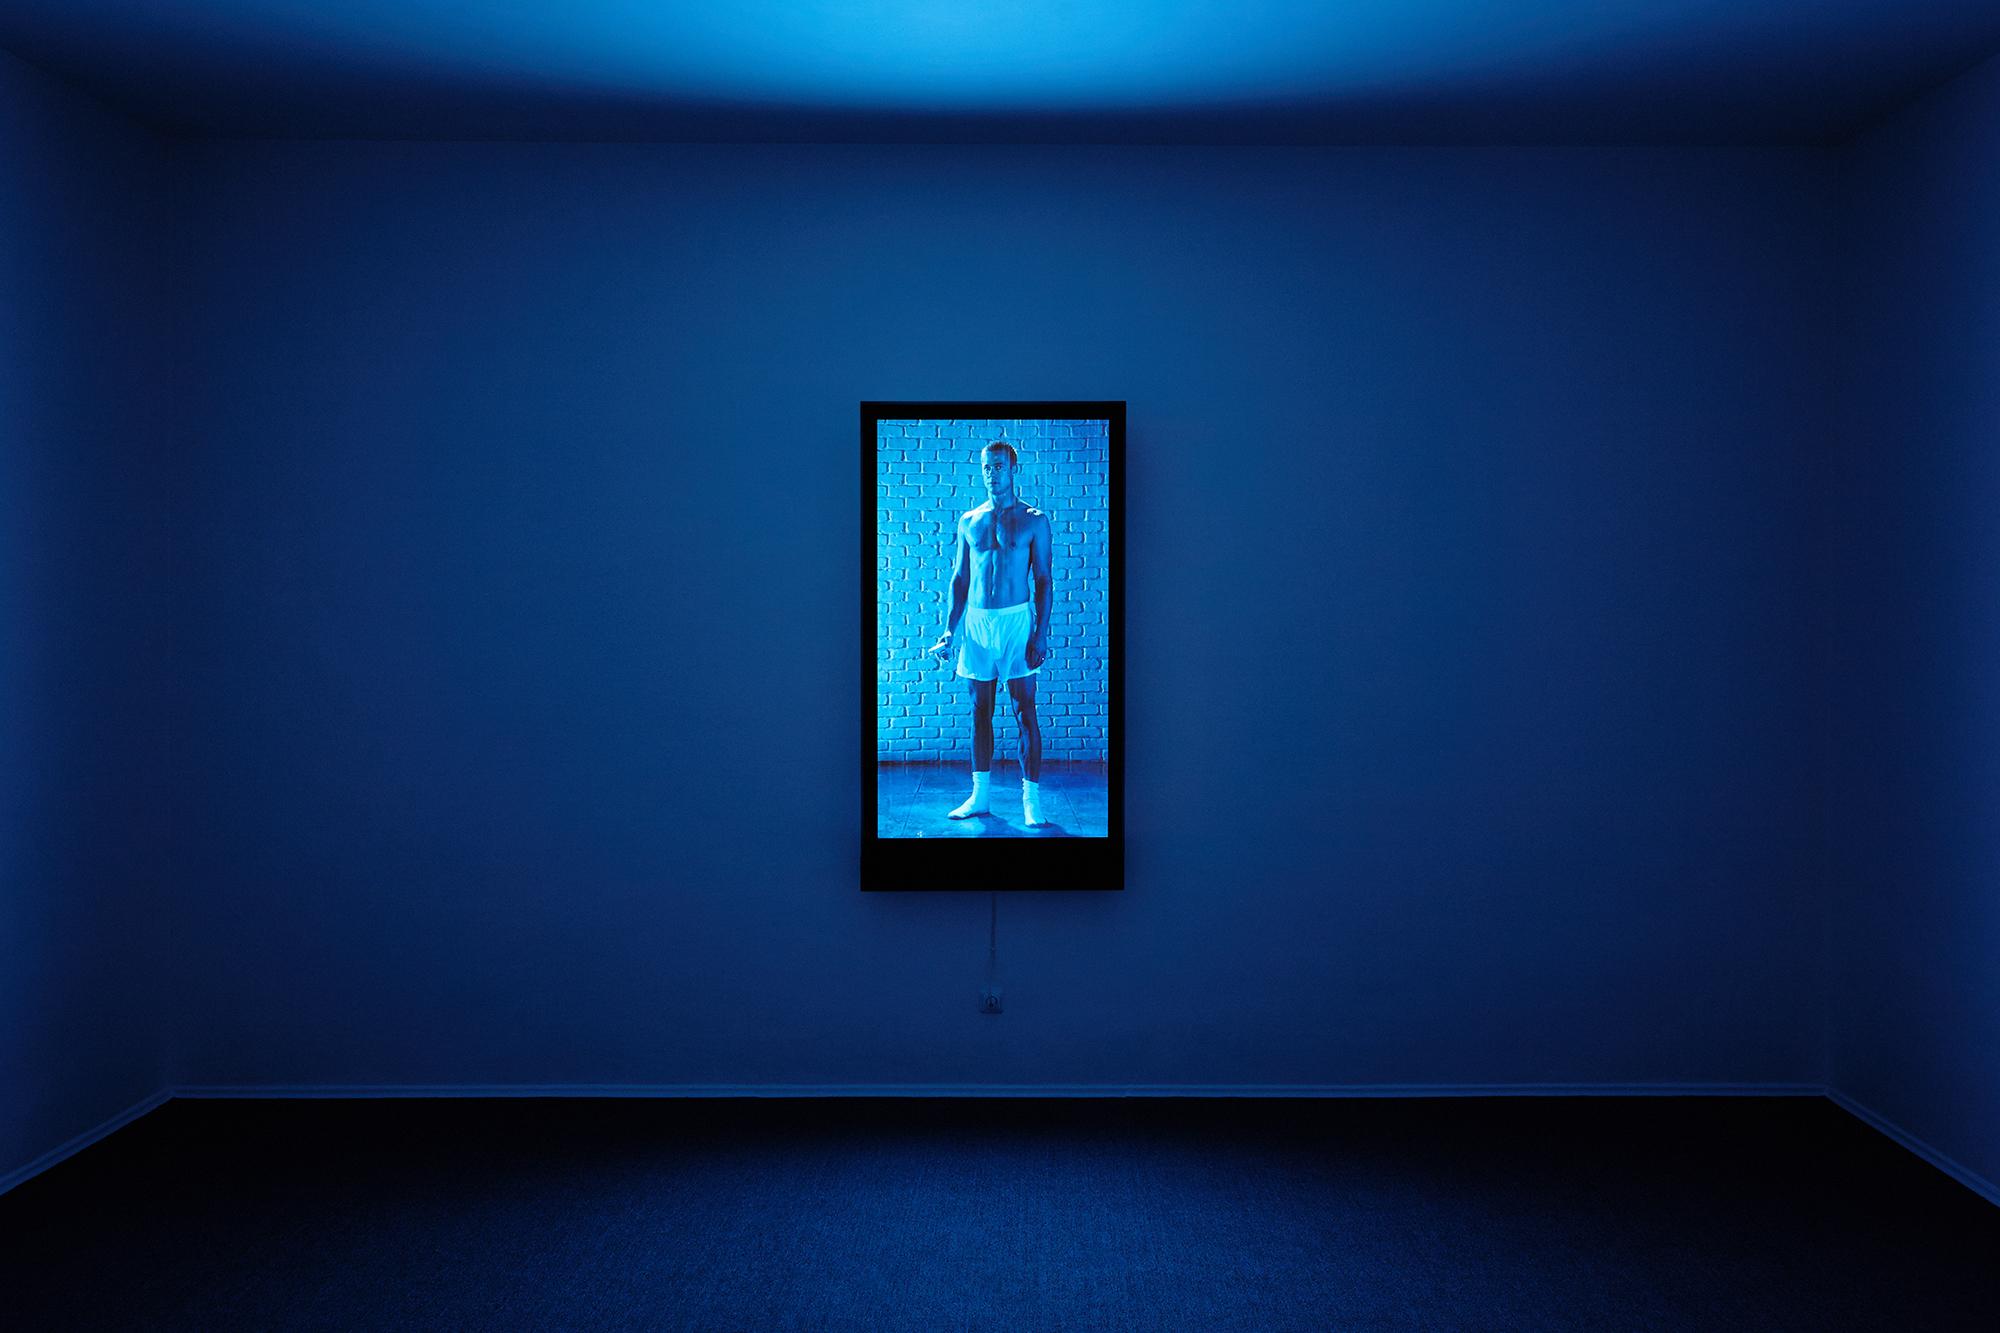 Robert_Willson_exhibition_28.jpg